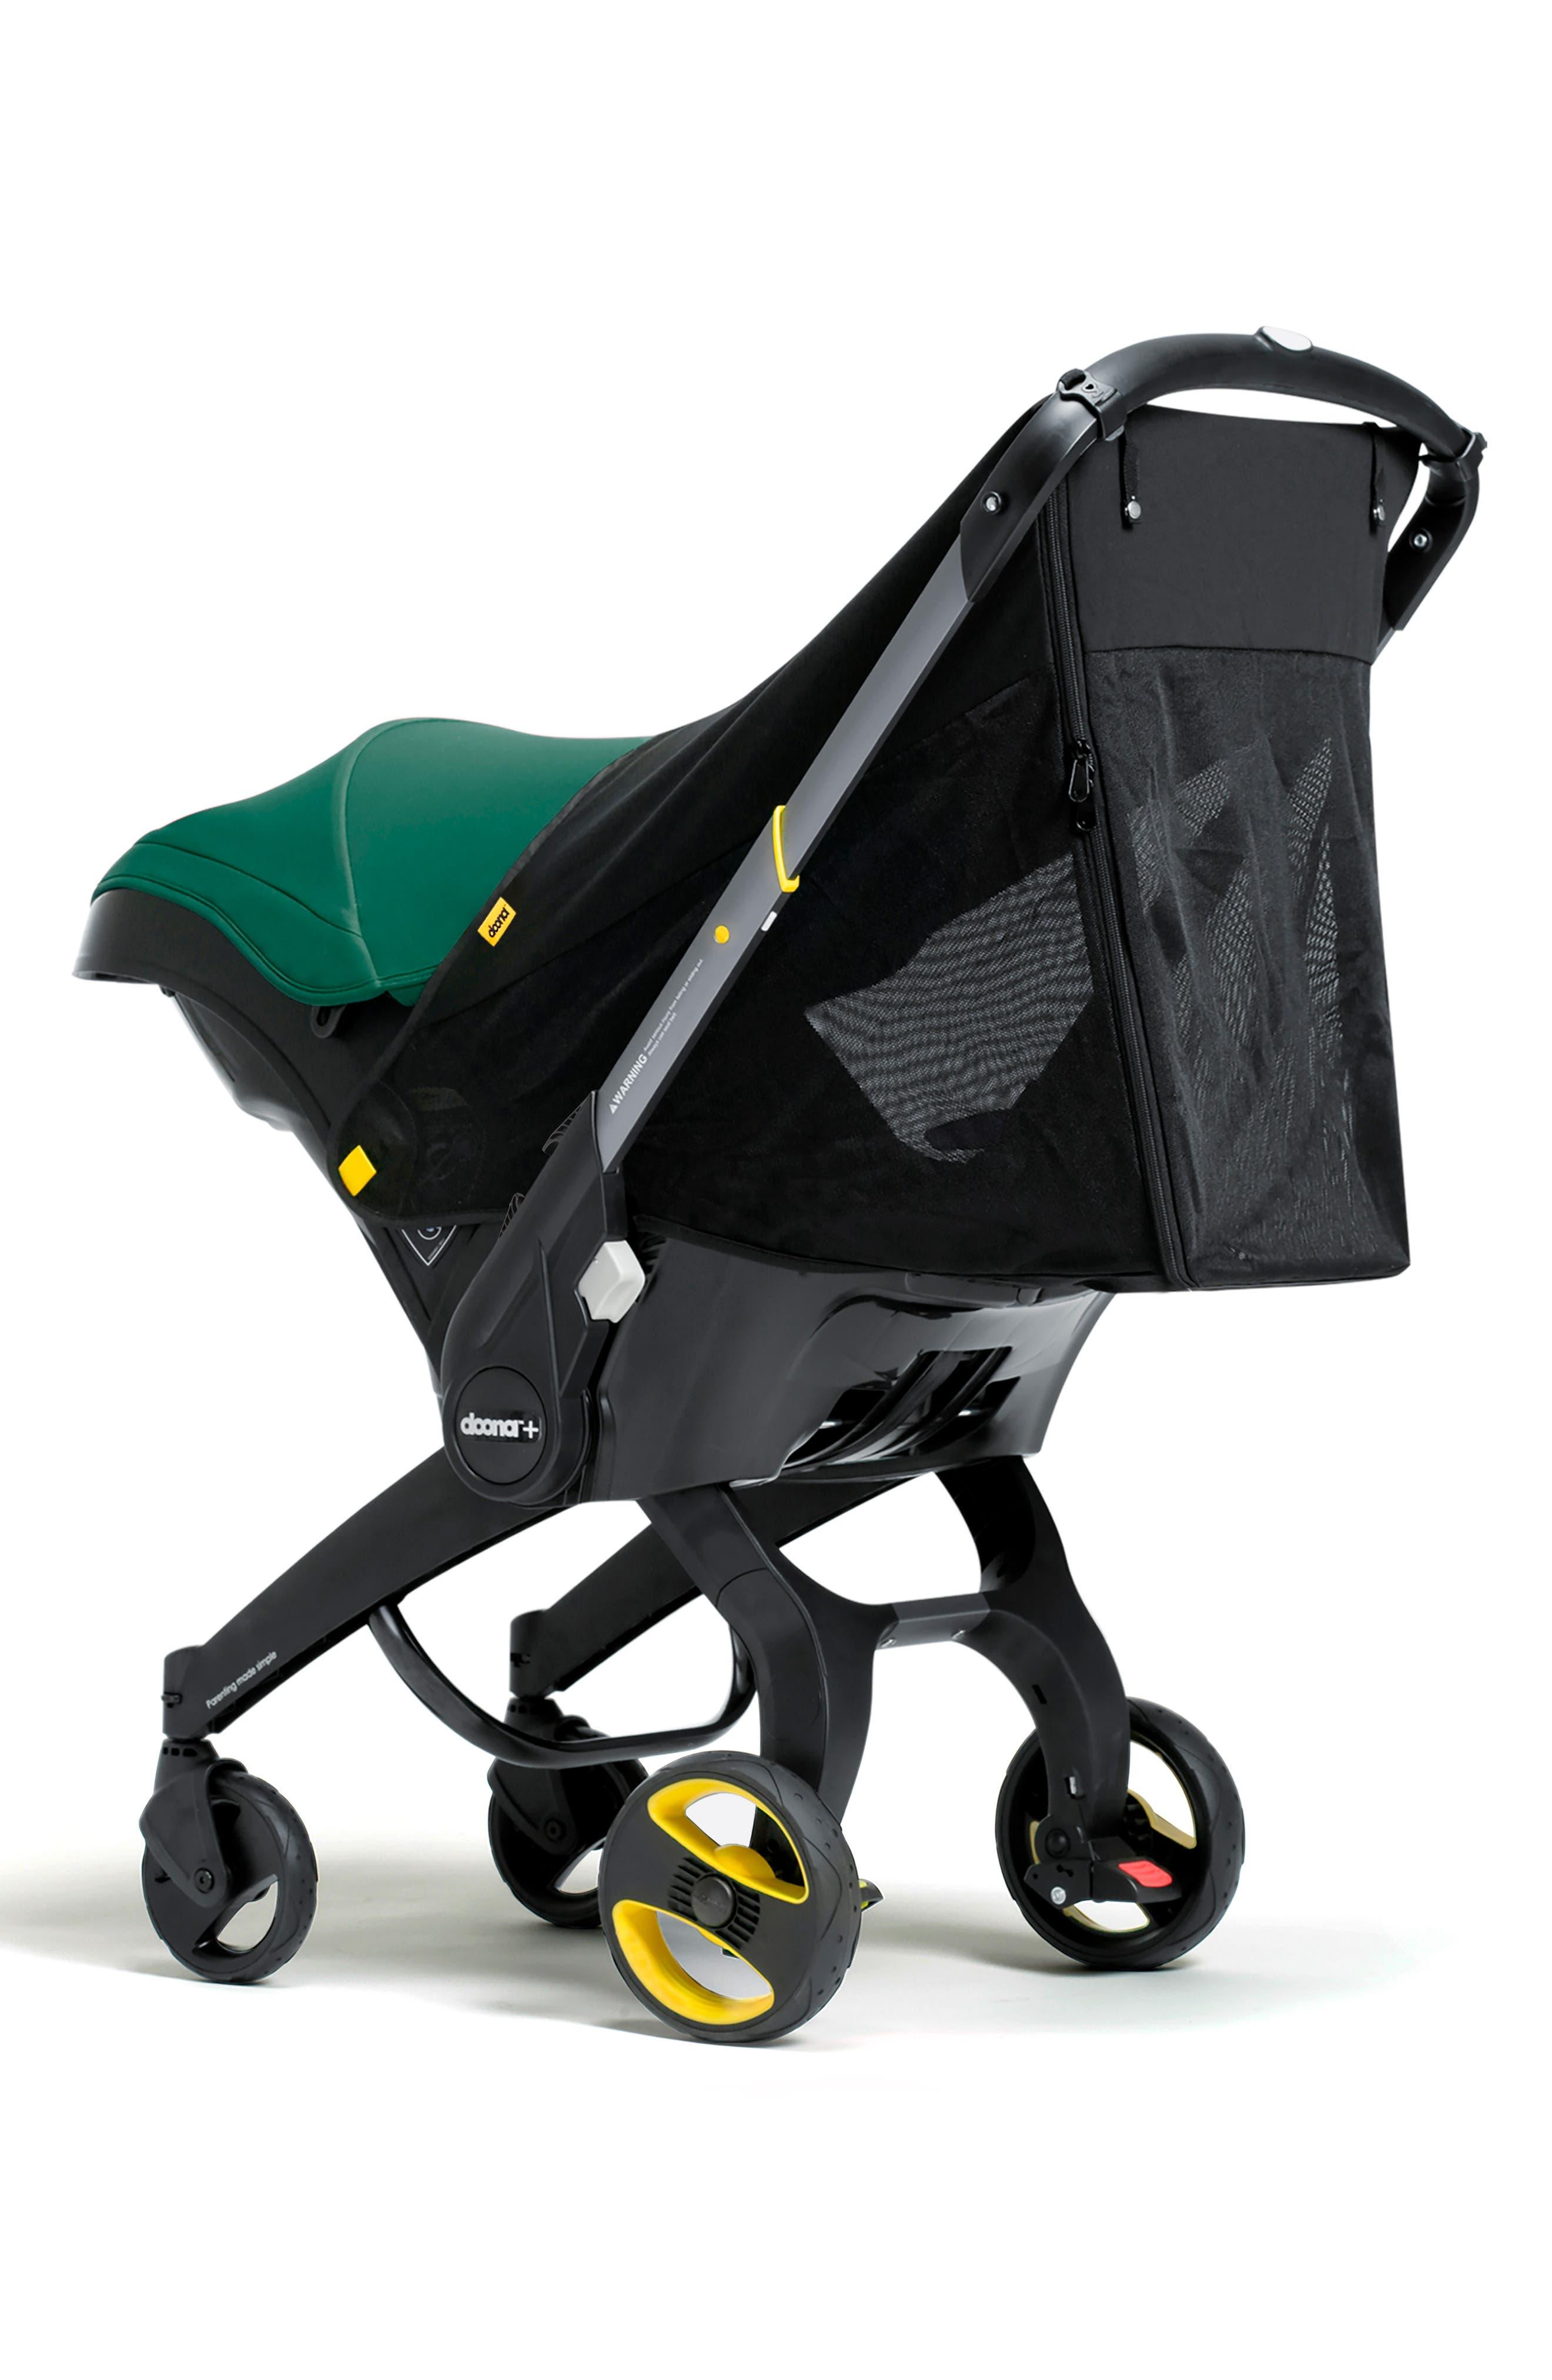 Doona Baby Gear & Essentials: Strollers, Diaper Bags & Toys | Nordstrom